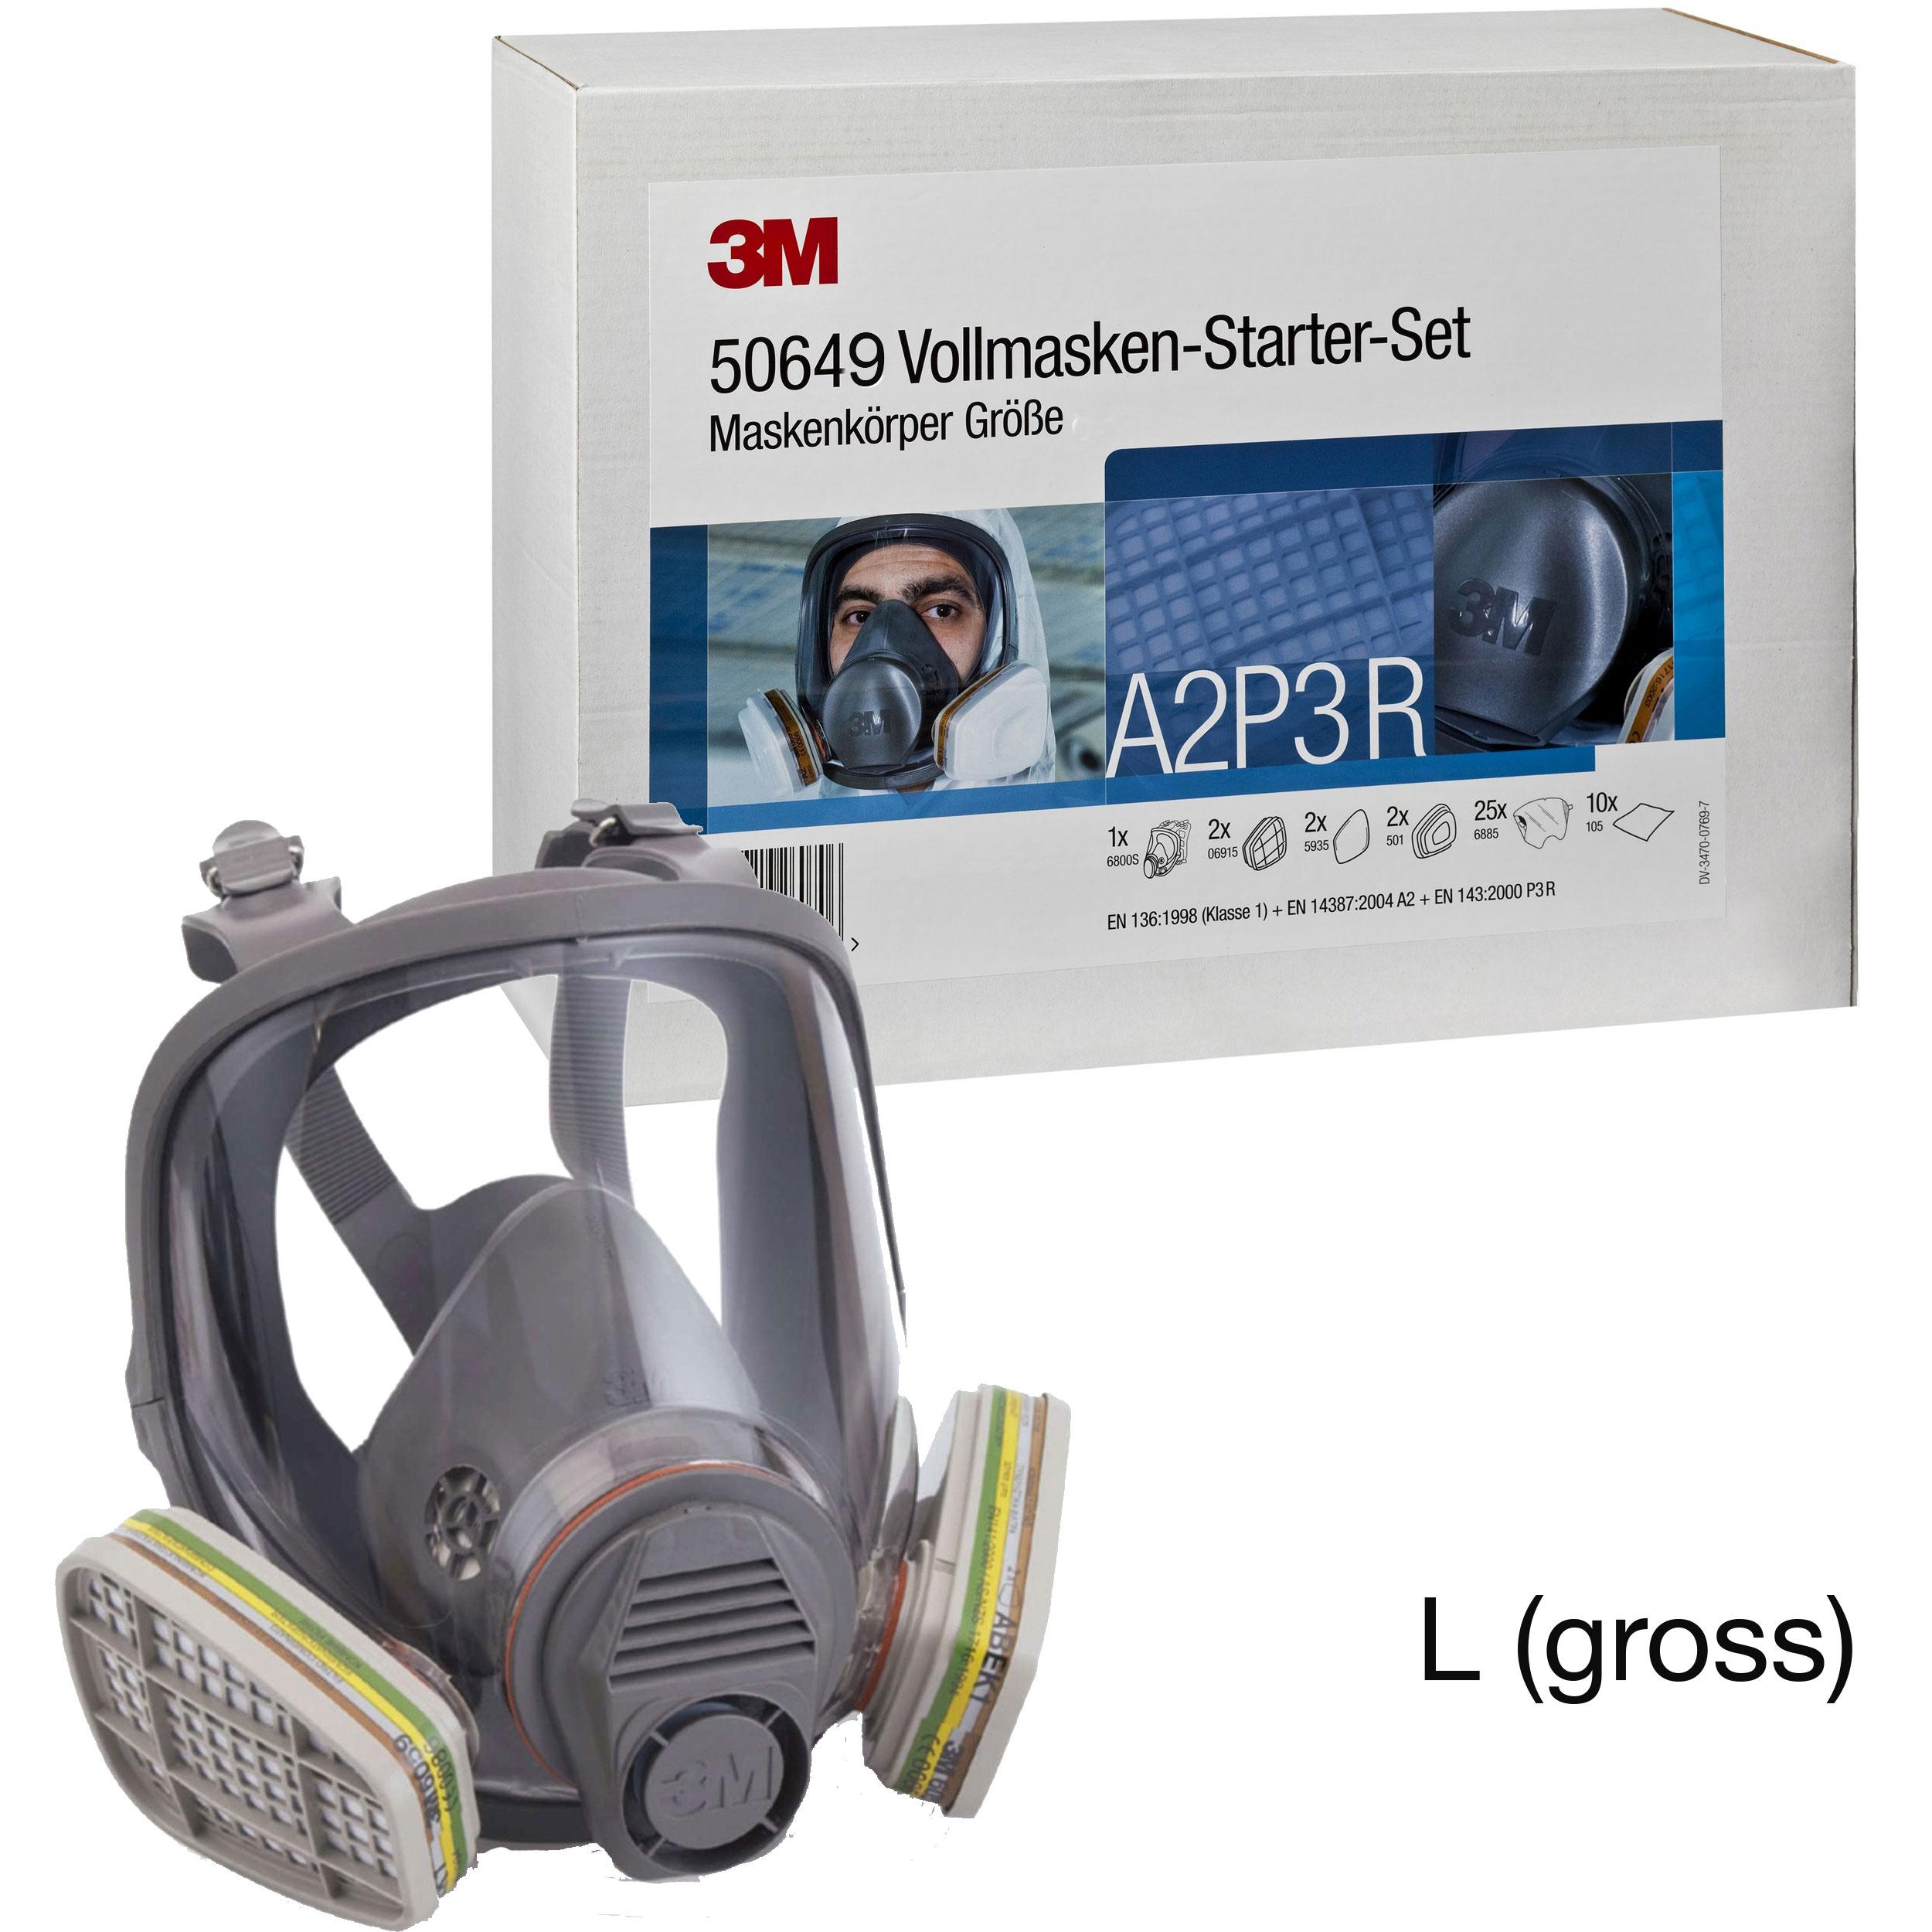 3M 6900Kit (50649) Starterkit Atemschutz-Vollmaske, Maskenkörper aus Silikon, A2P3, Grösse L (gross)